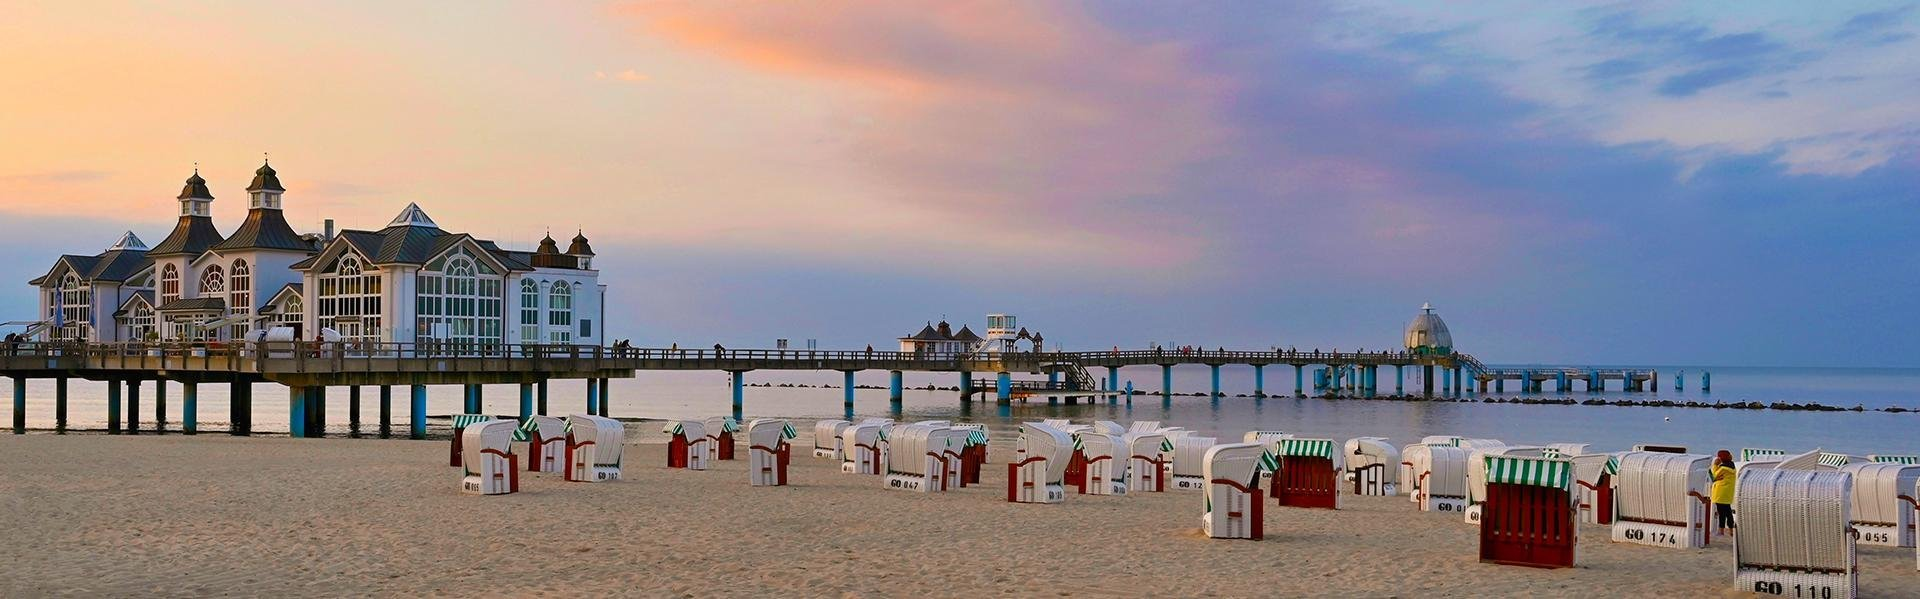 Strandpaviljoen Sellin op Rügen, Duitsland